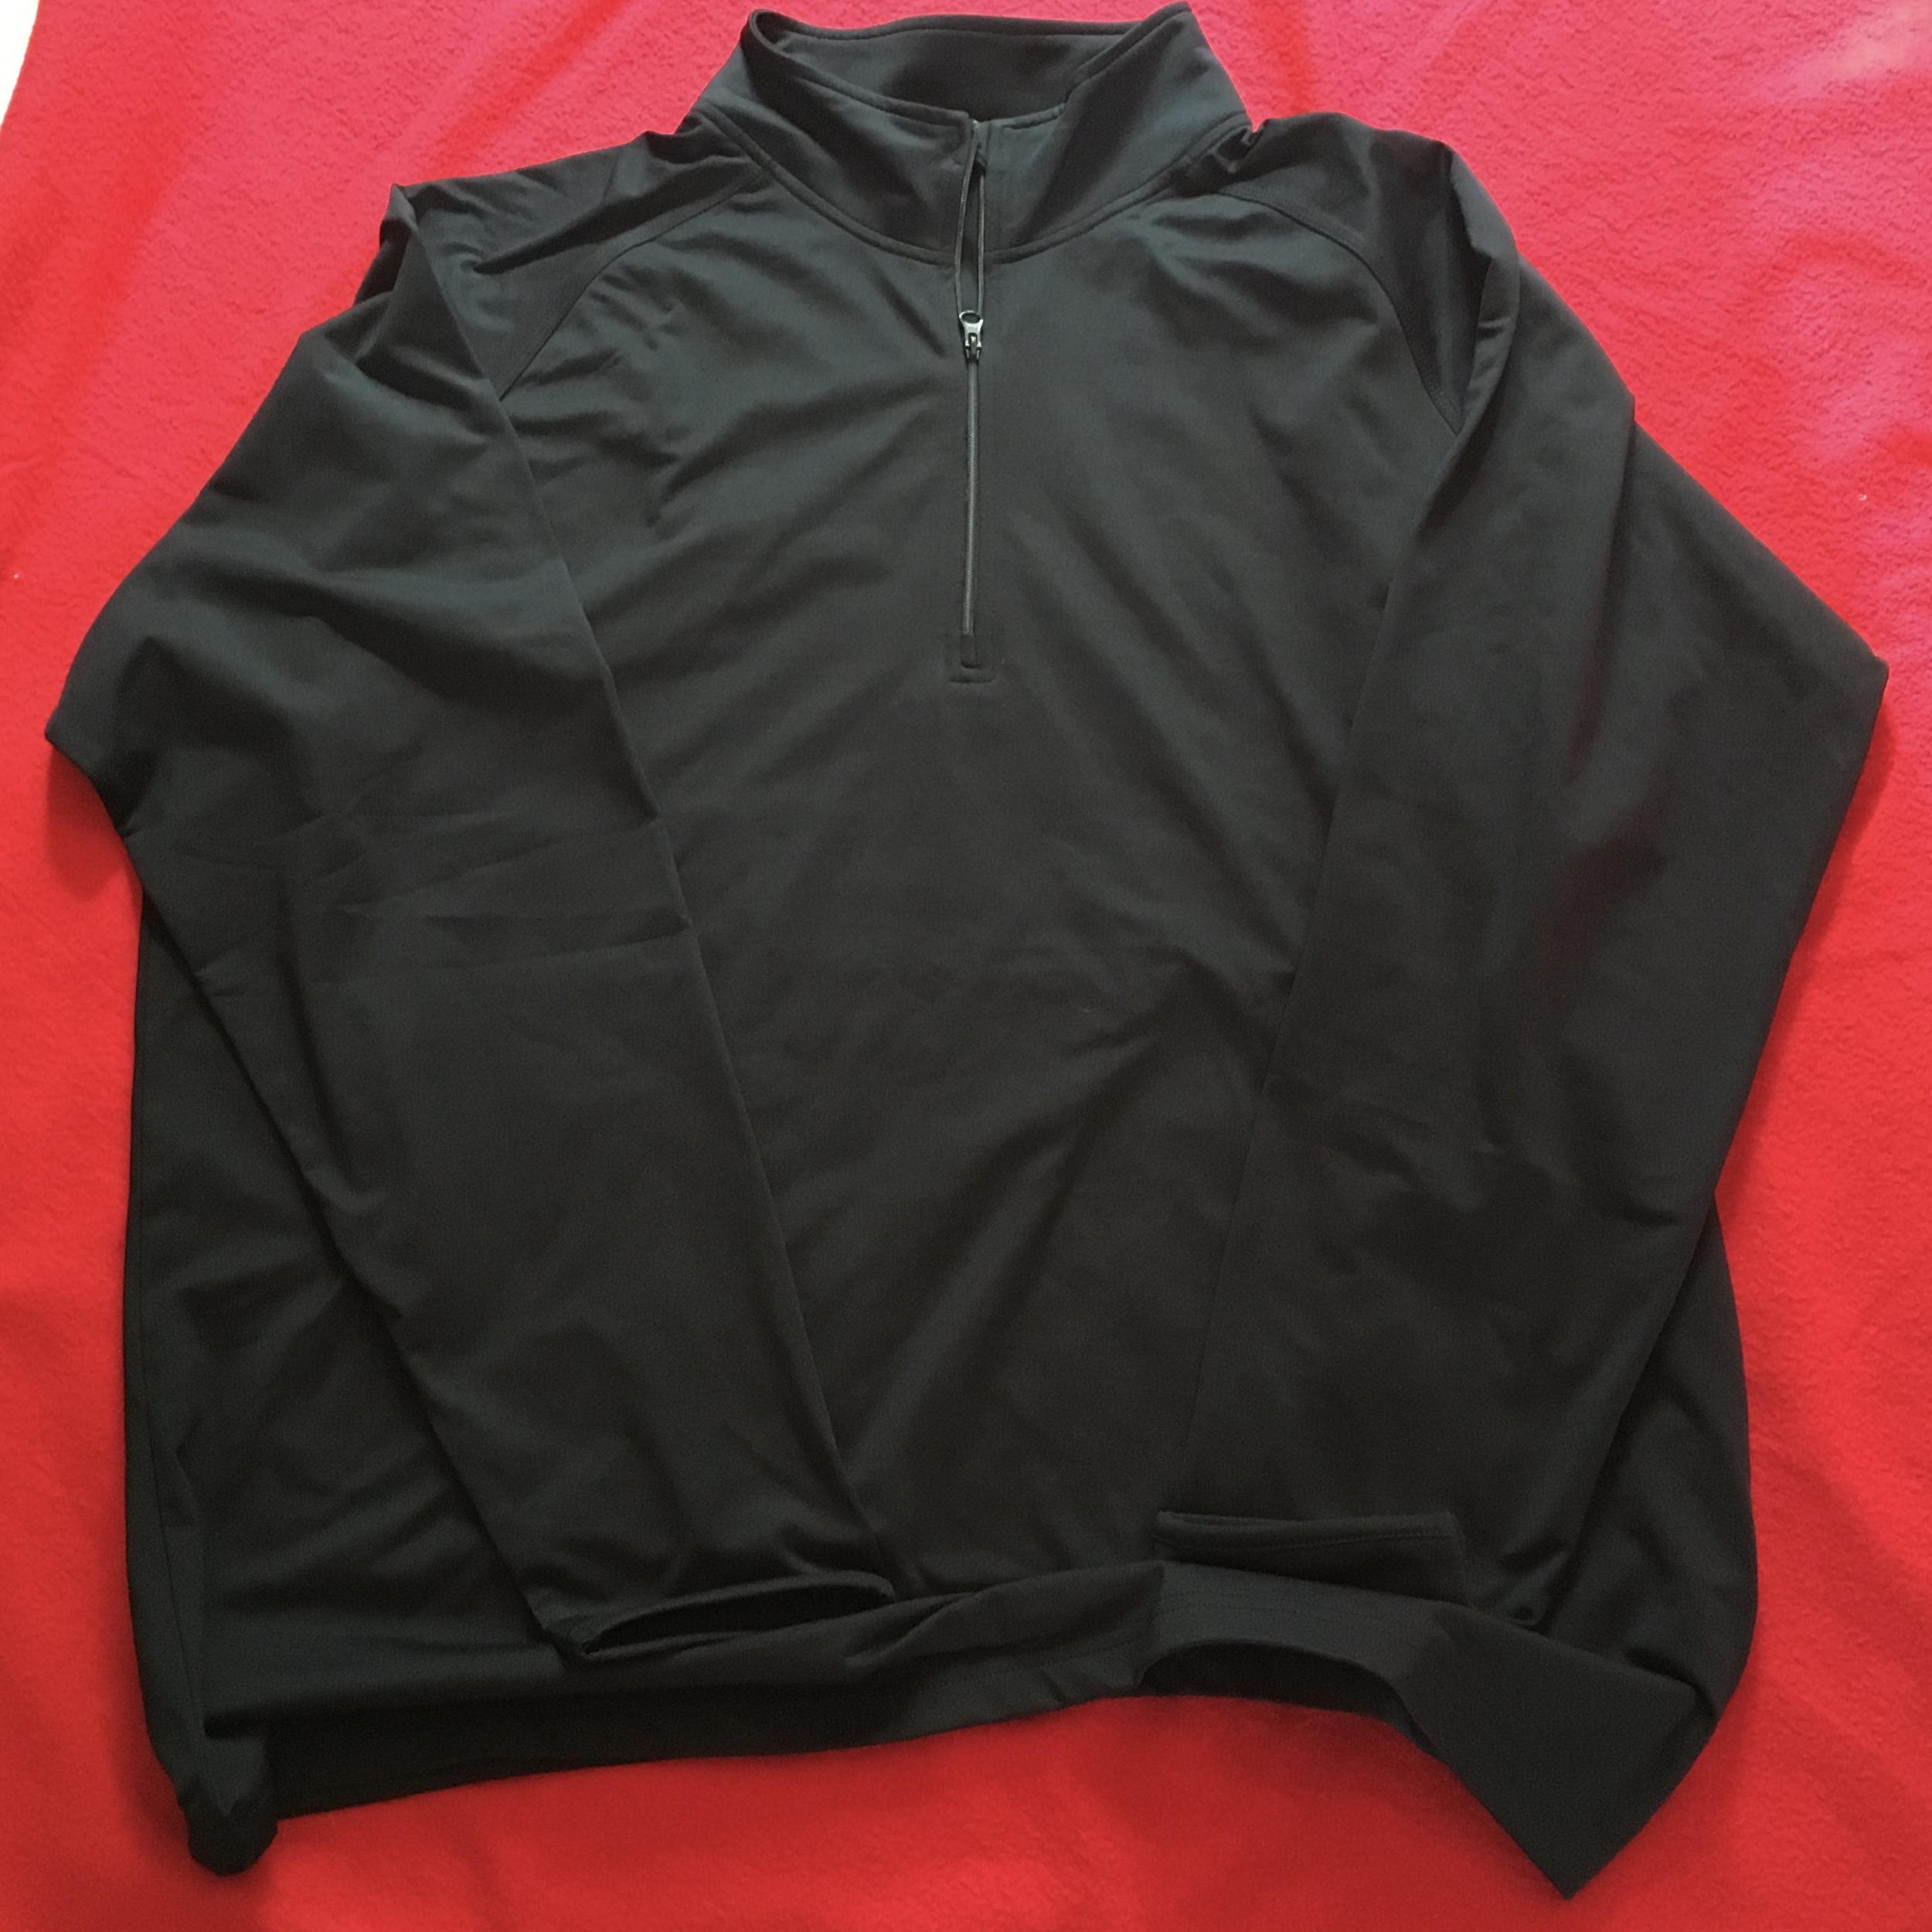 SW Sport tek black 1/4 zip w/ either embroidered or glitter logo